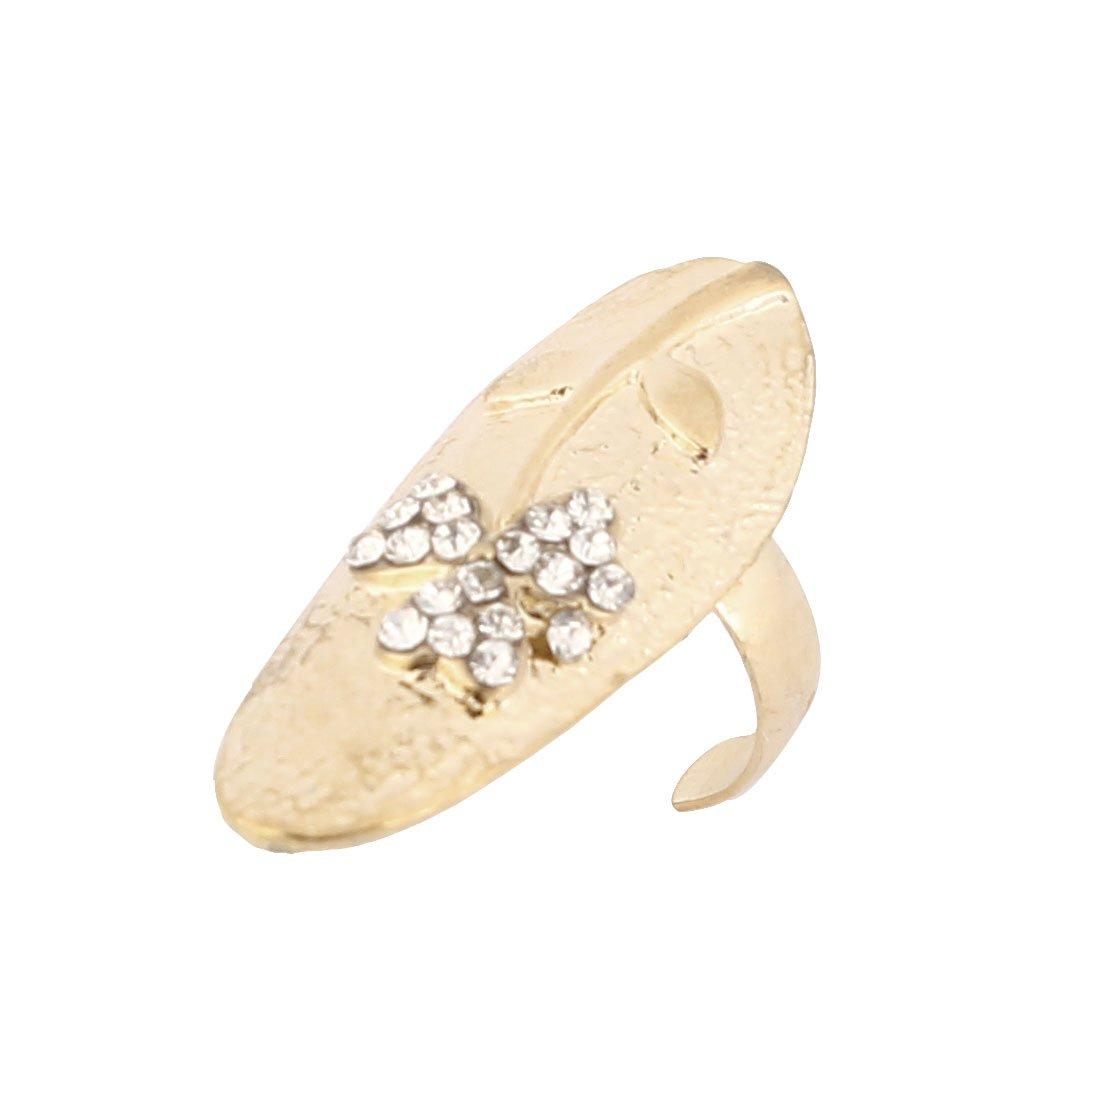 Sourcingmap–Strass motivo floreale Lady Finger dita anello, Oro tono